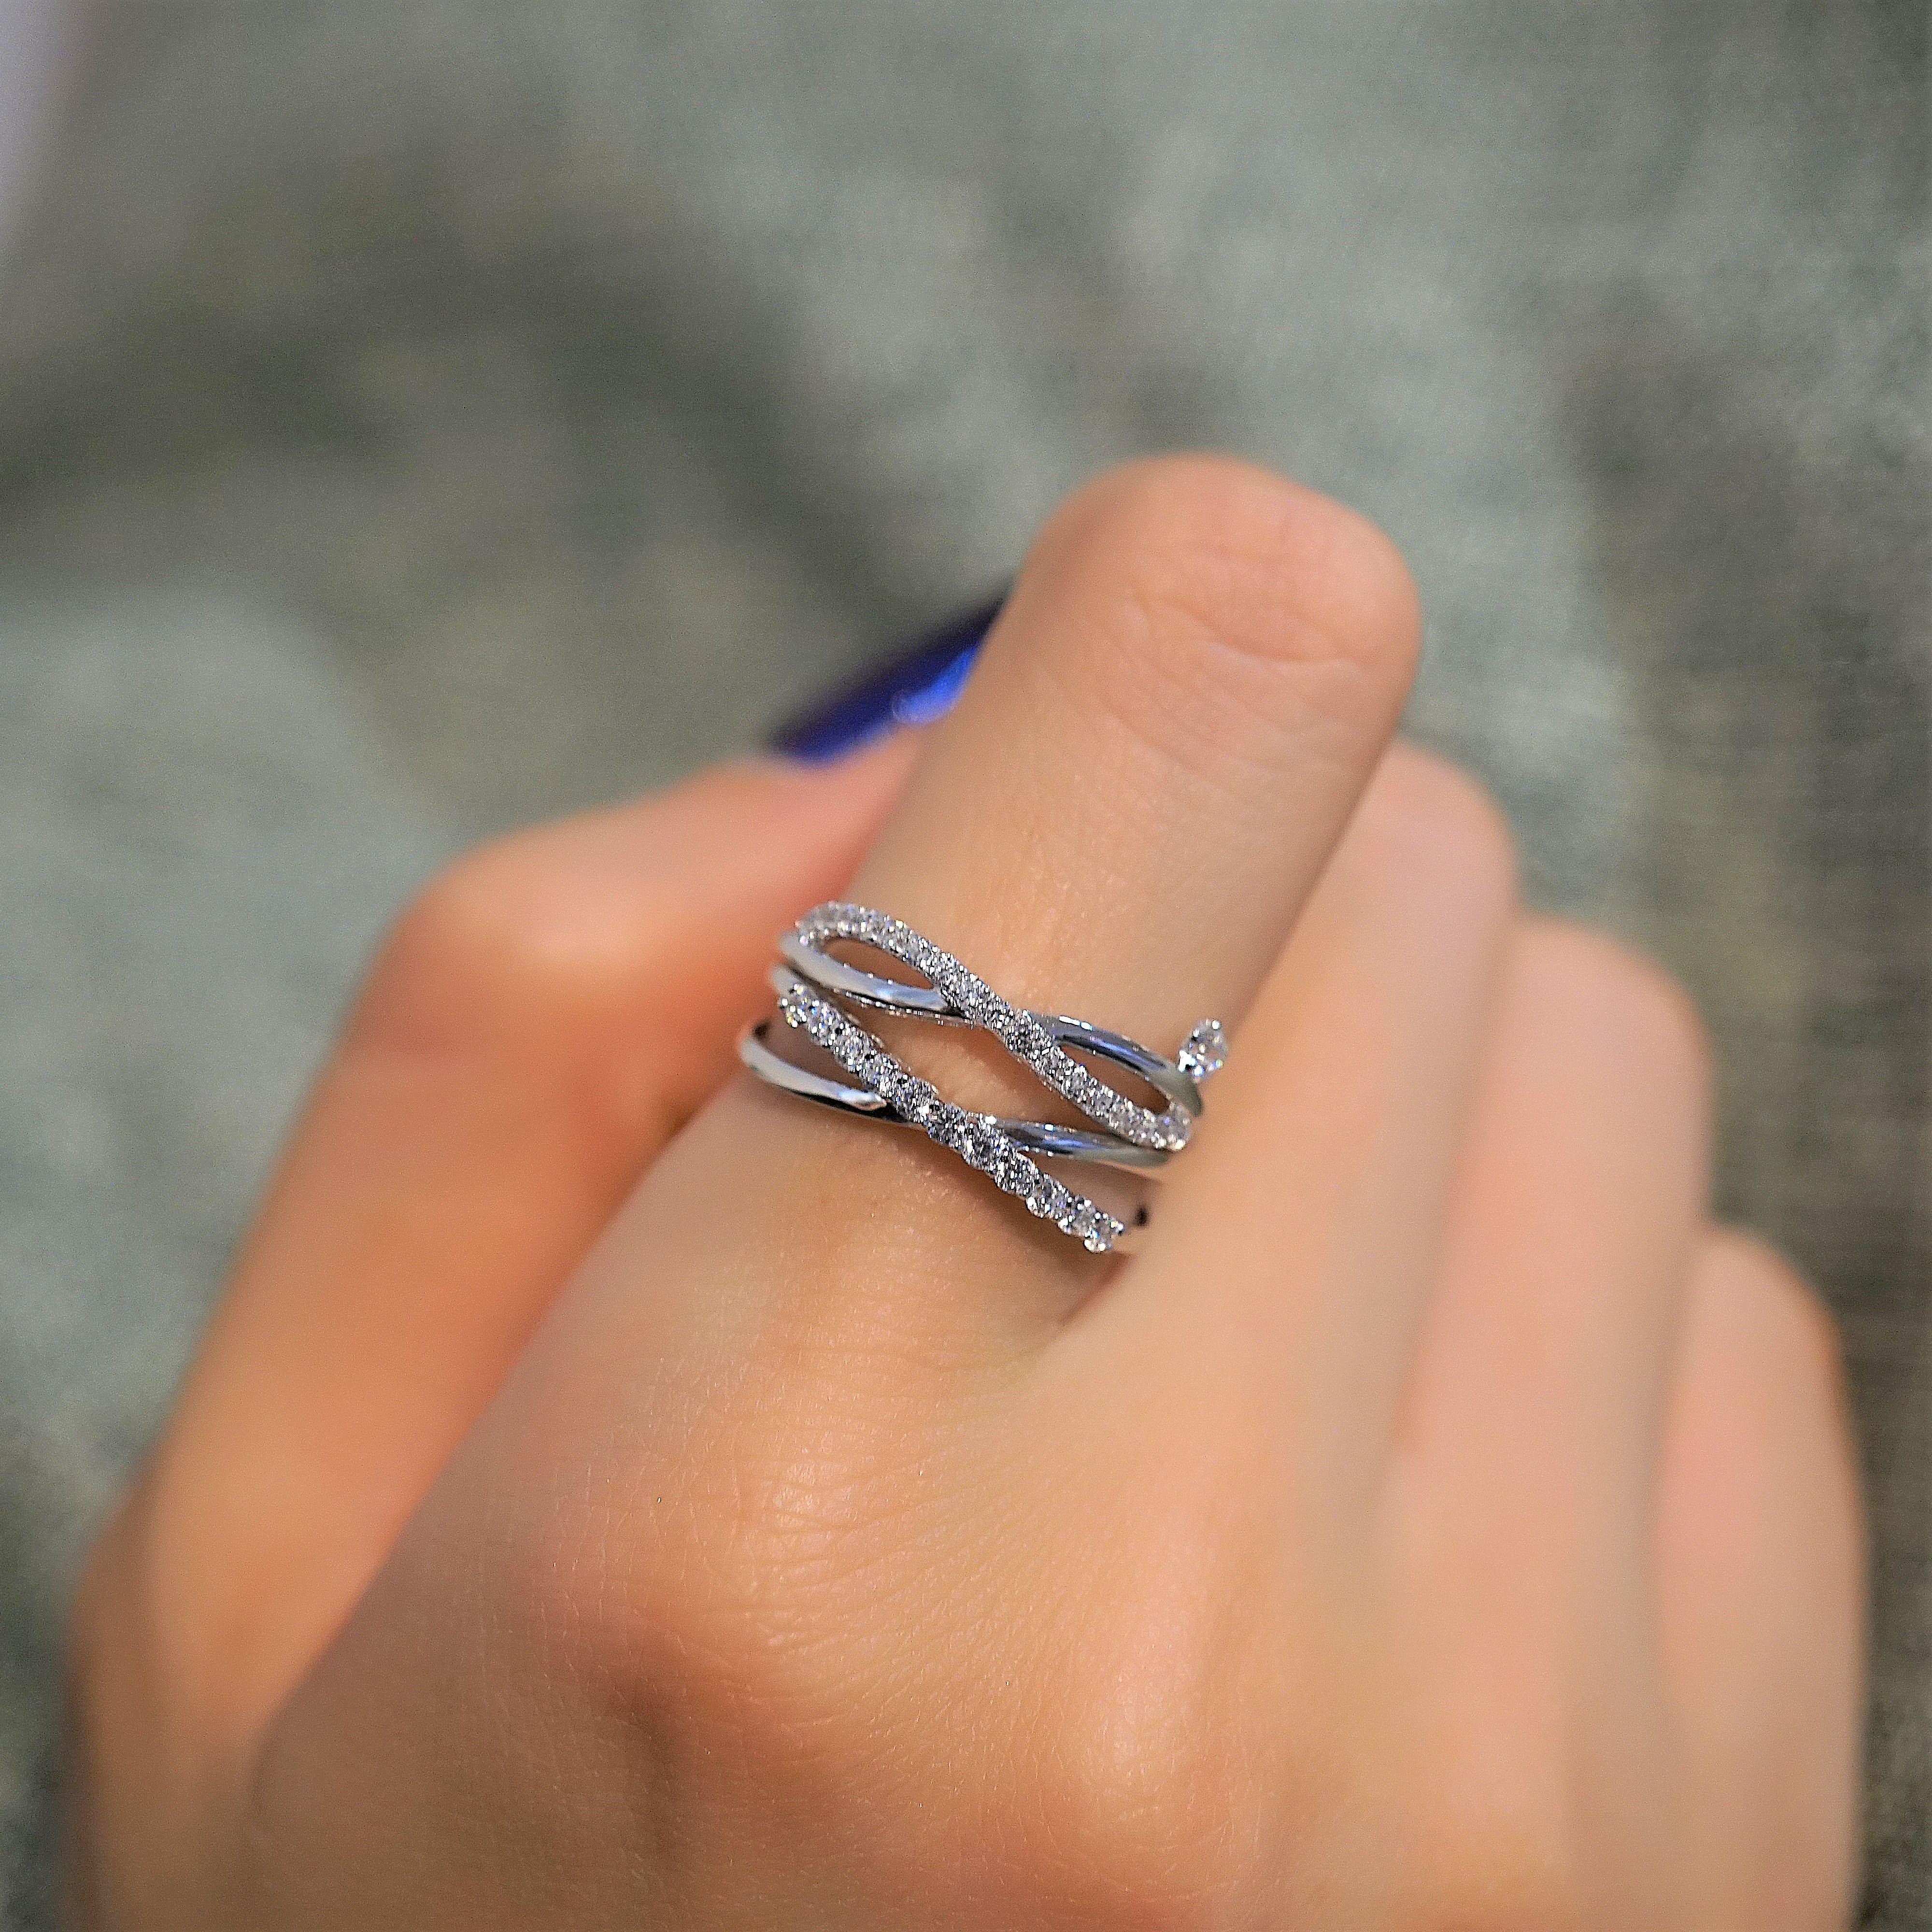 14k Gold X Ring / Criss Cross Ring / Wedding Gift / CZ